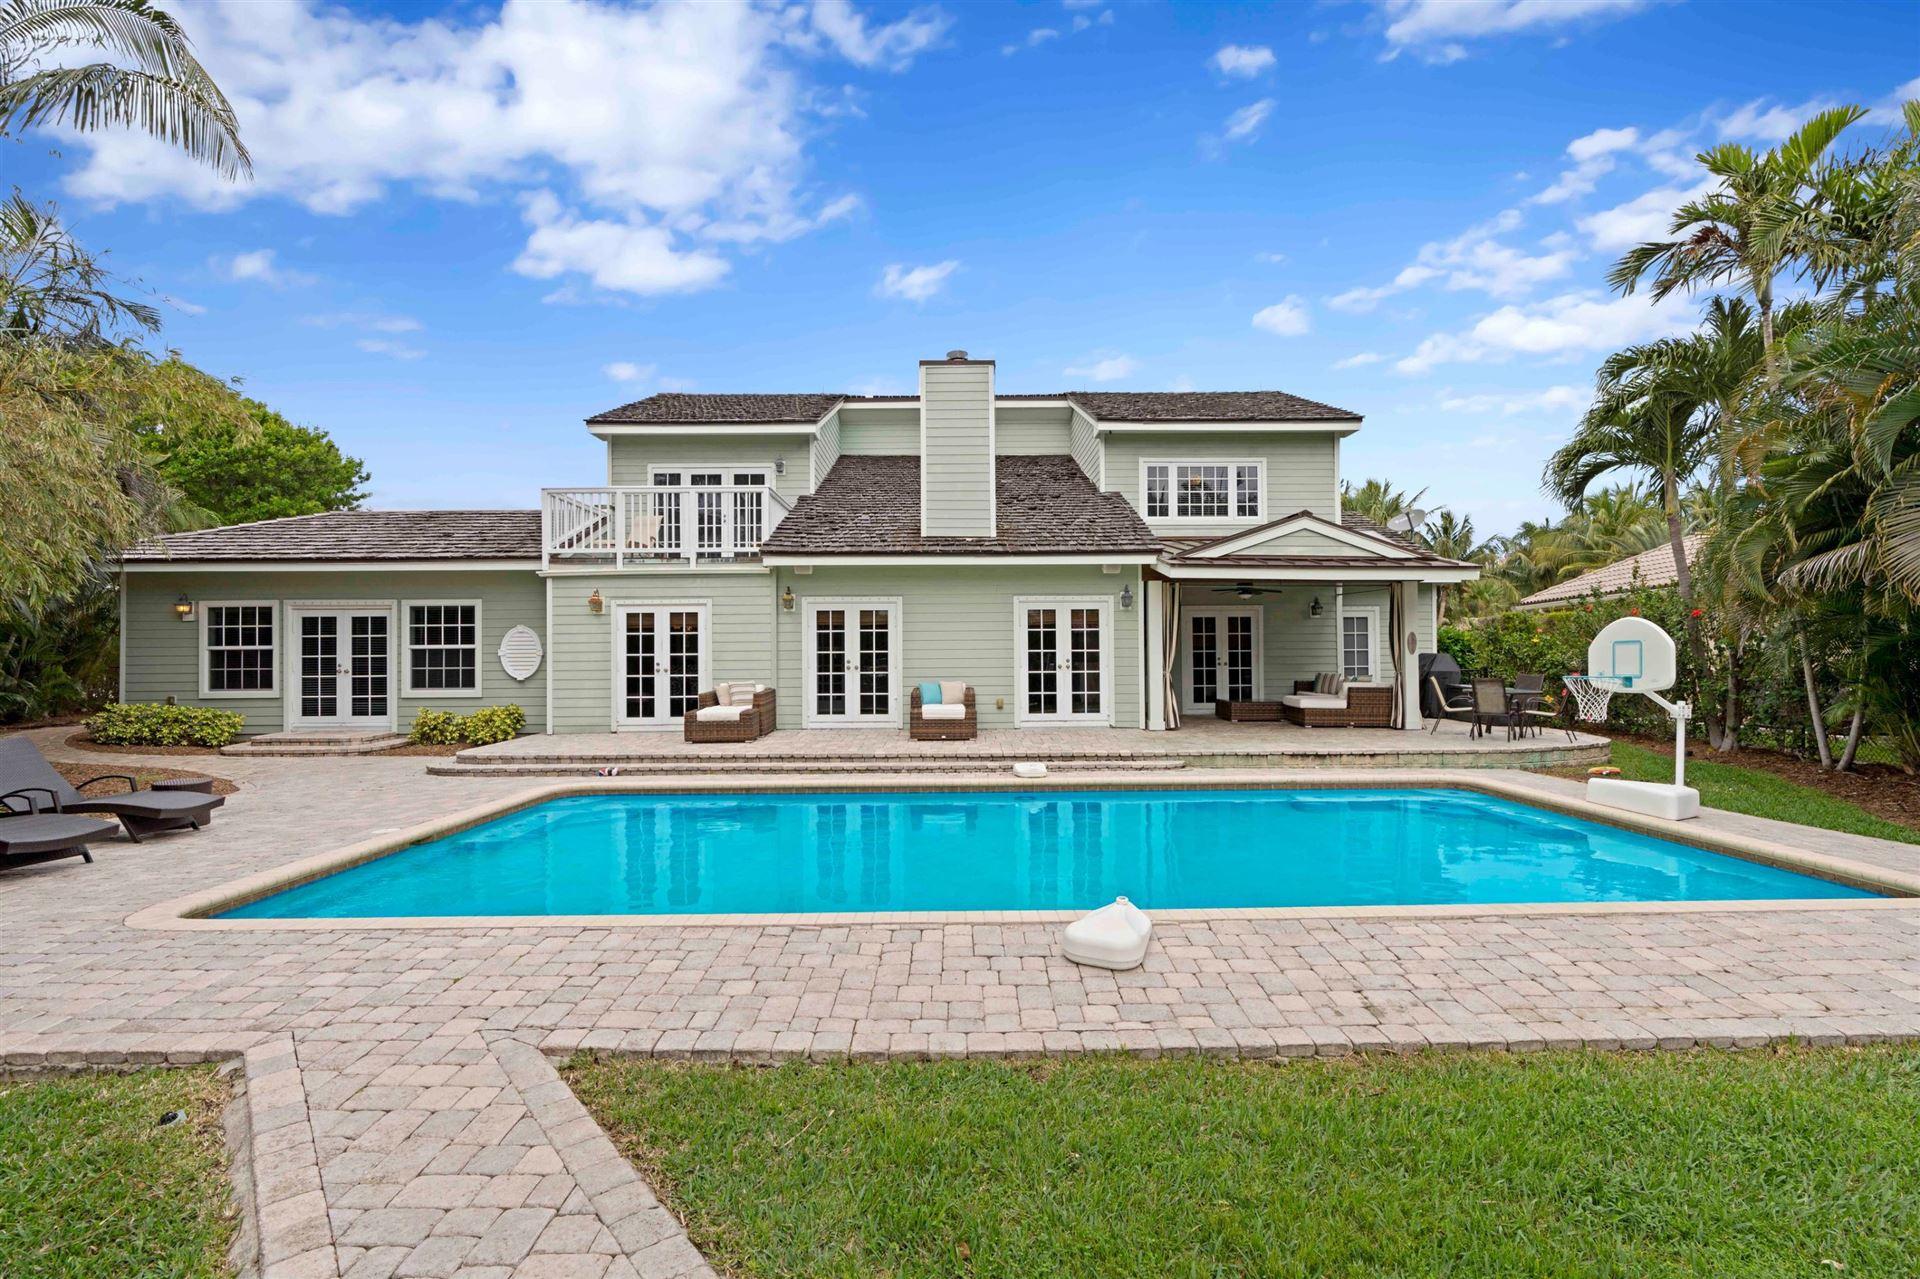 Photo of 142 Bowsprit Drive, North Palm Beach, FL 33408 (MLS # RX-10694771)